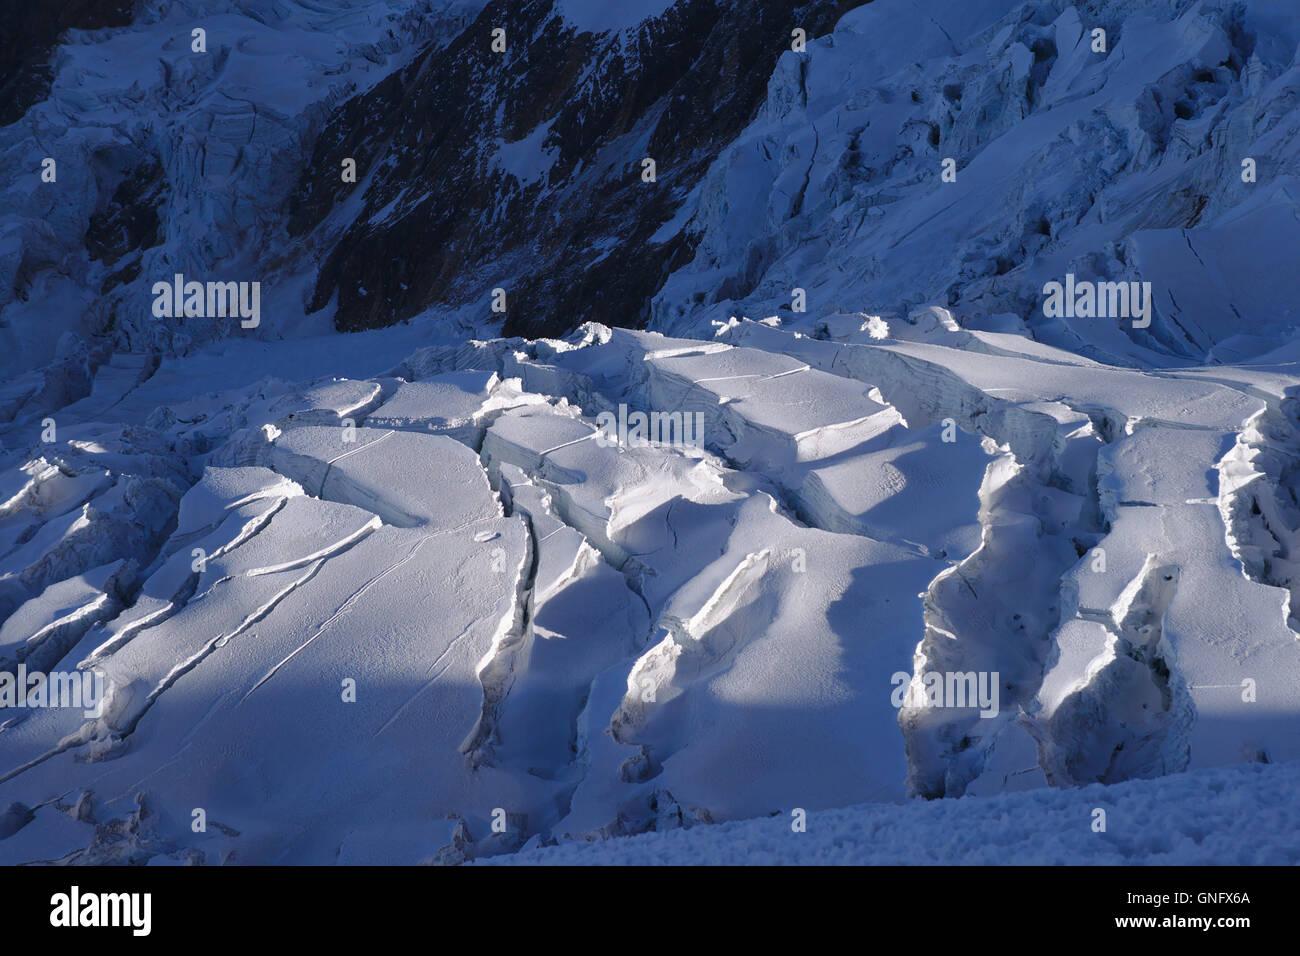 Glacier on Illimani, Bolivia - Stock Image